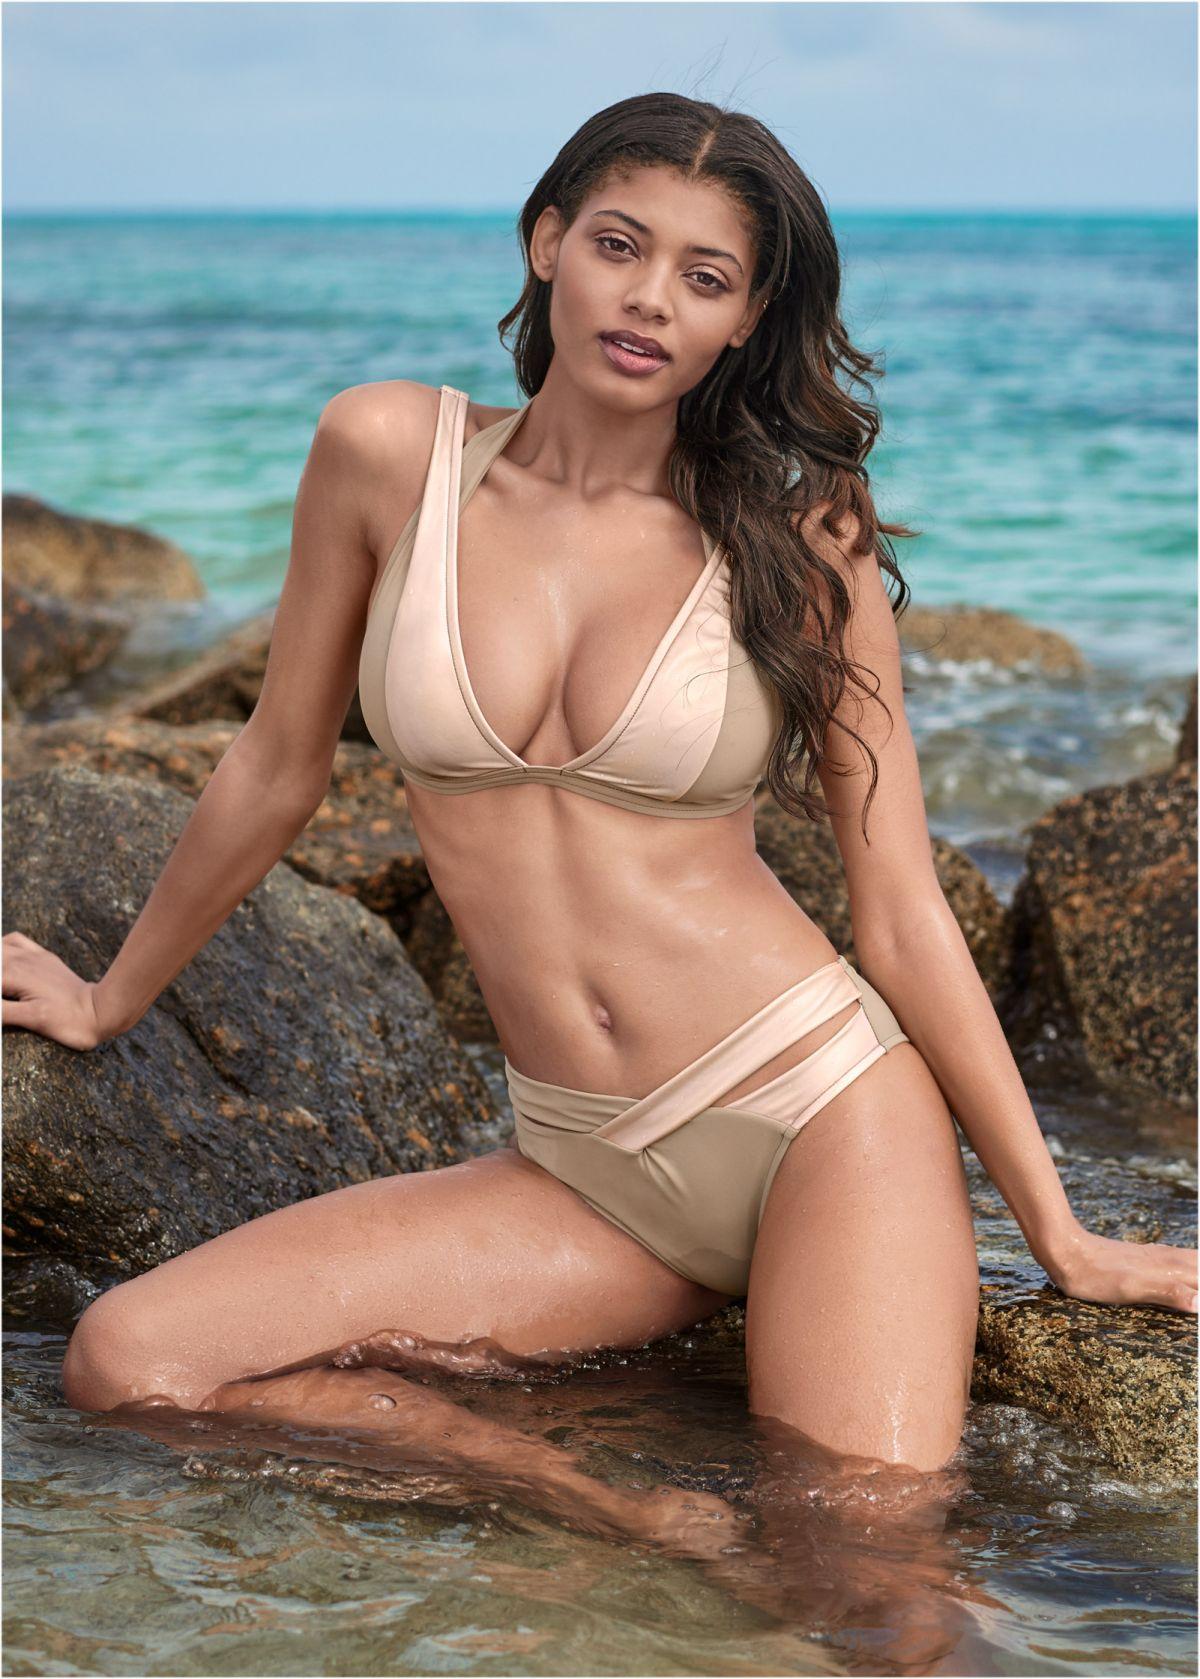 Danielle Herrington - 2019 Sports Illustrated Swimsuit